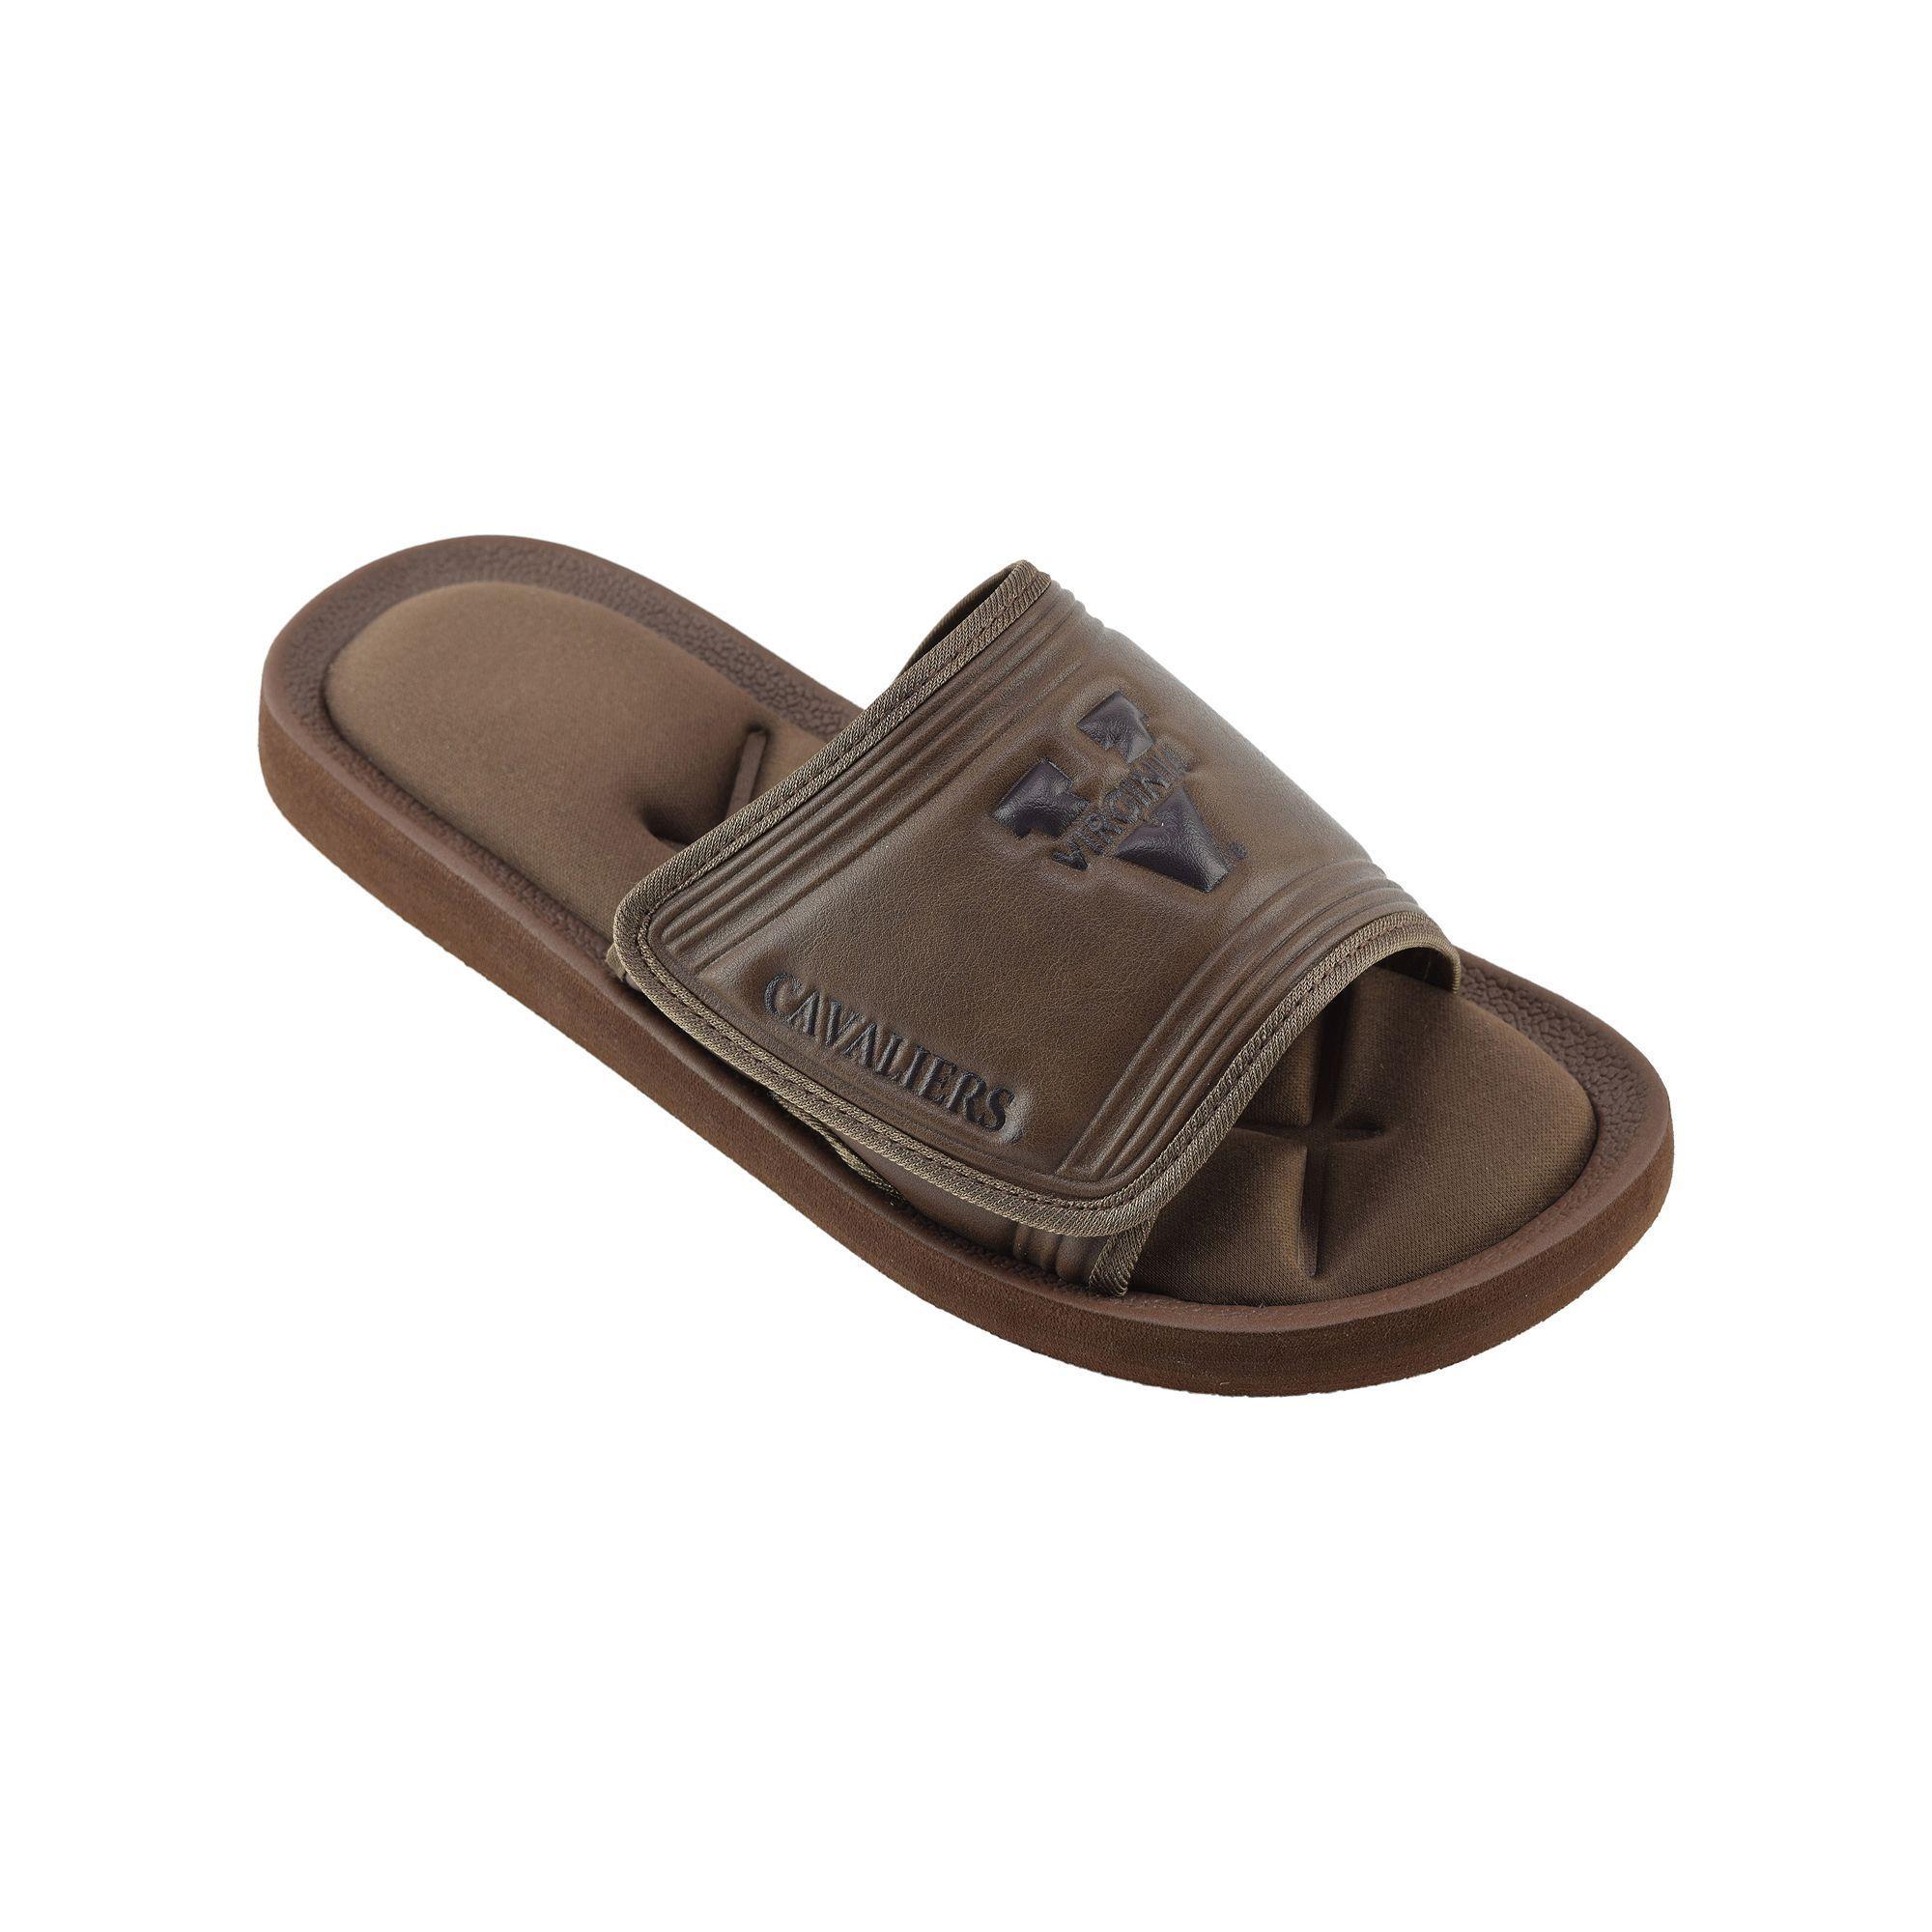 Men's Virginia Cavaliers ... Memory Foam Slide Sandals geniue stockist sale online outlet visit outlet classic from china sale online cheap sale for sale uMjW5E2